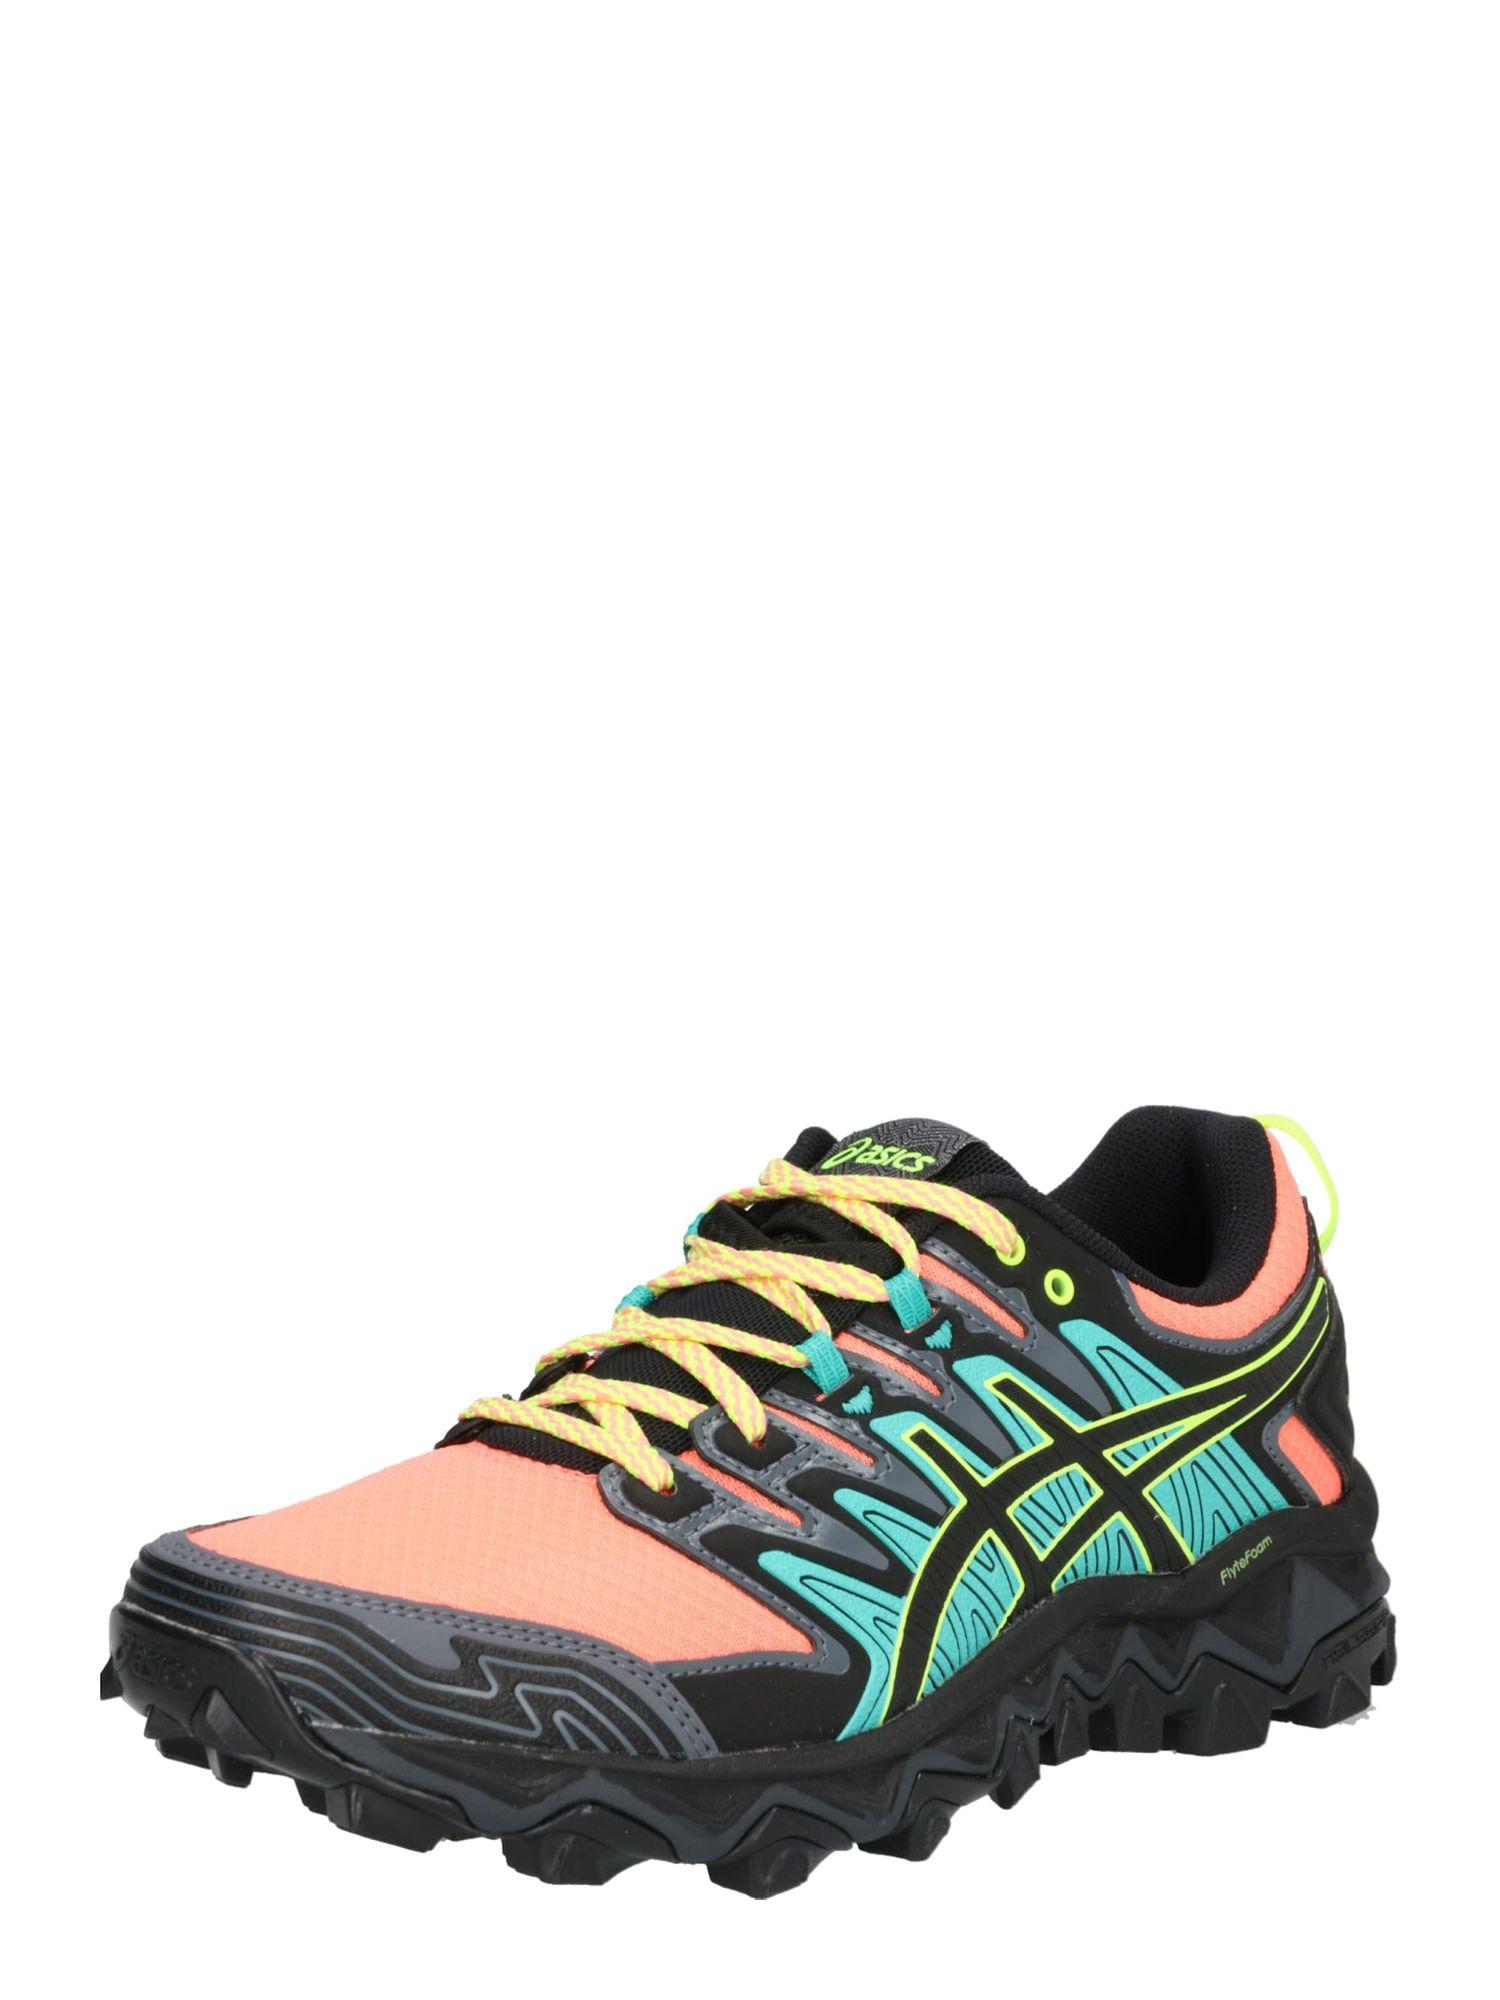 Sport-Schuhe ´GEL-FUJITRABUCO 7´